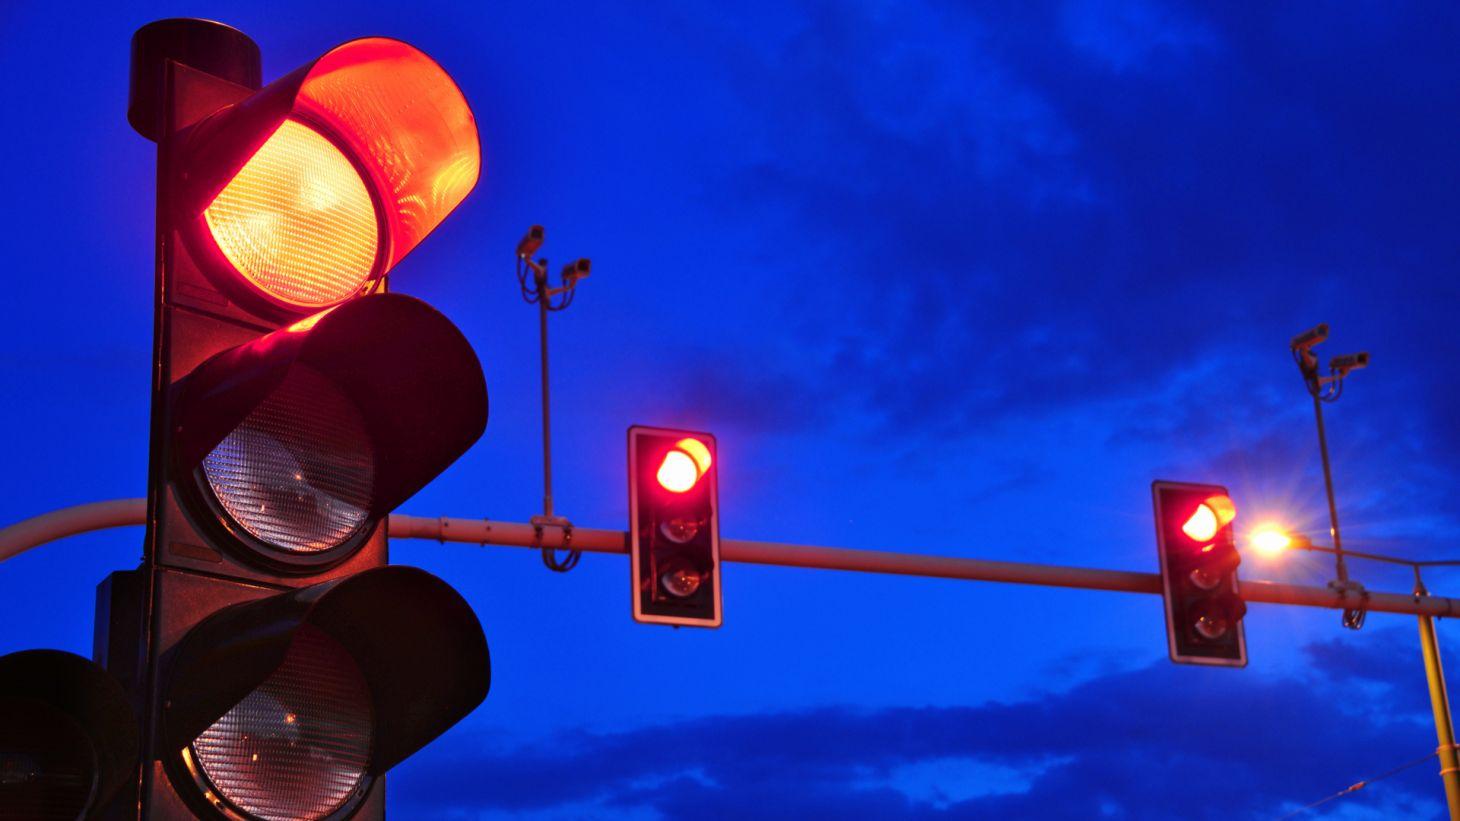 sinalizacao semaforo transito vermelho duante madrugada